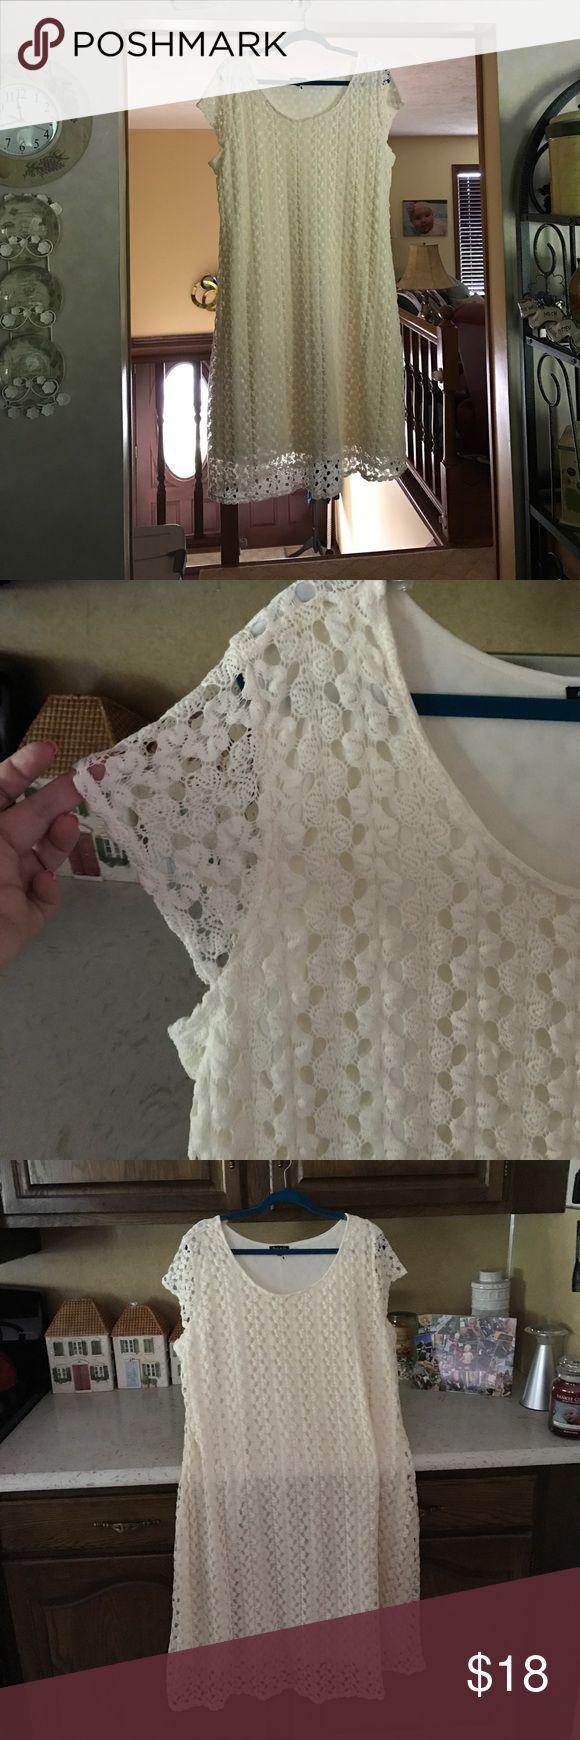 Cream Cap Sleeve Crochet Knit Dress Cream colored crochet knit cap sleeve dress - brand new (no tags) never worn Dresses Midi